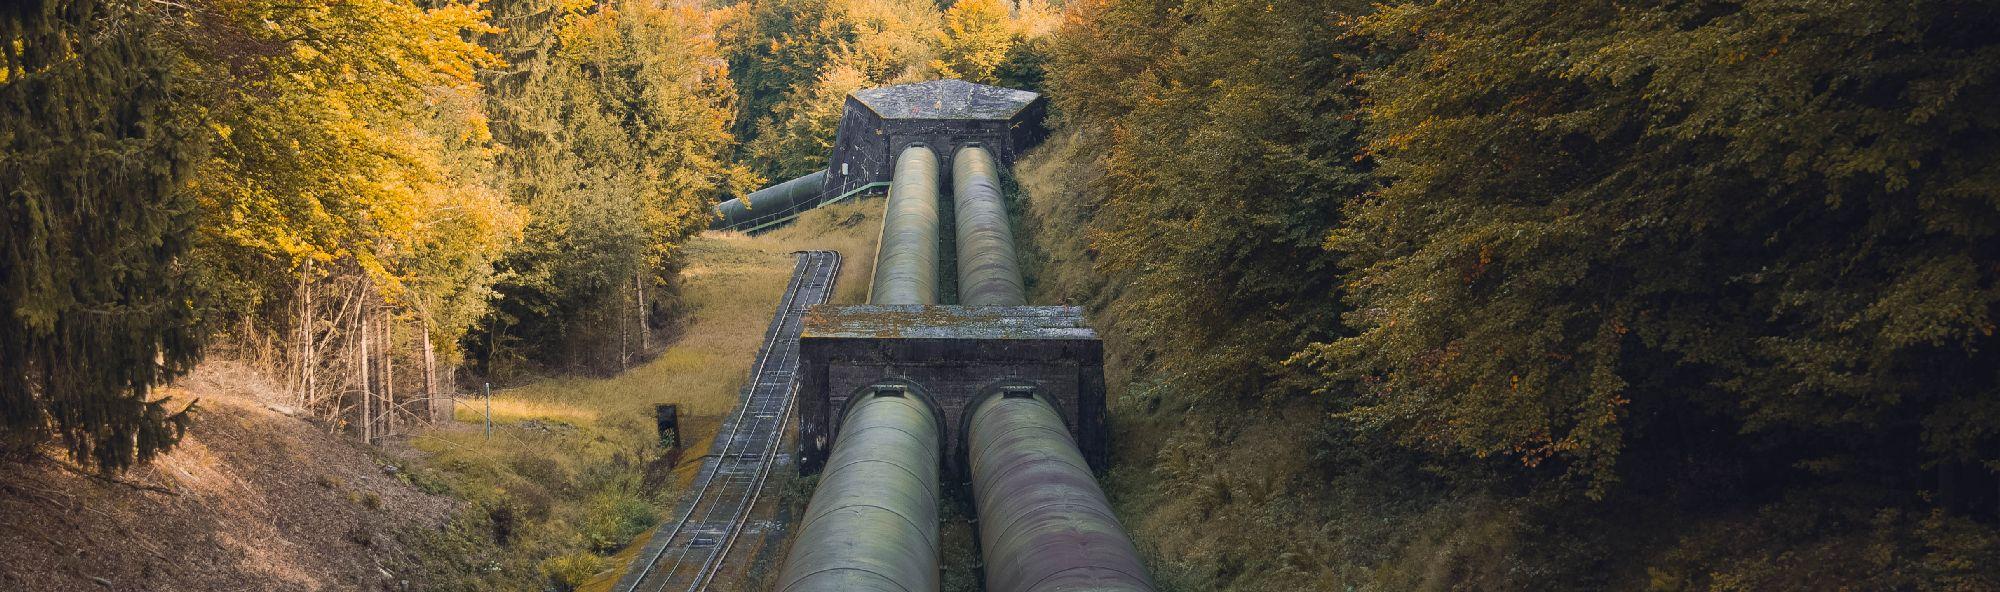 AleaSoft - Gaseoducto